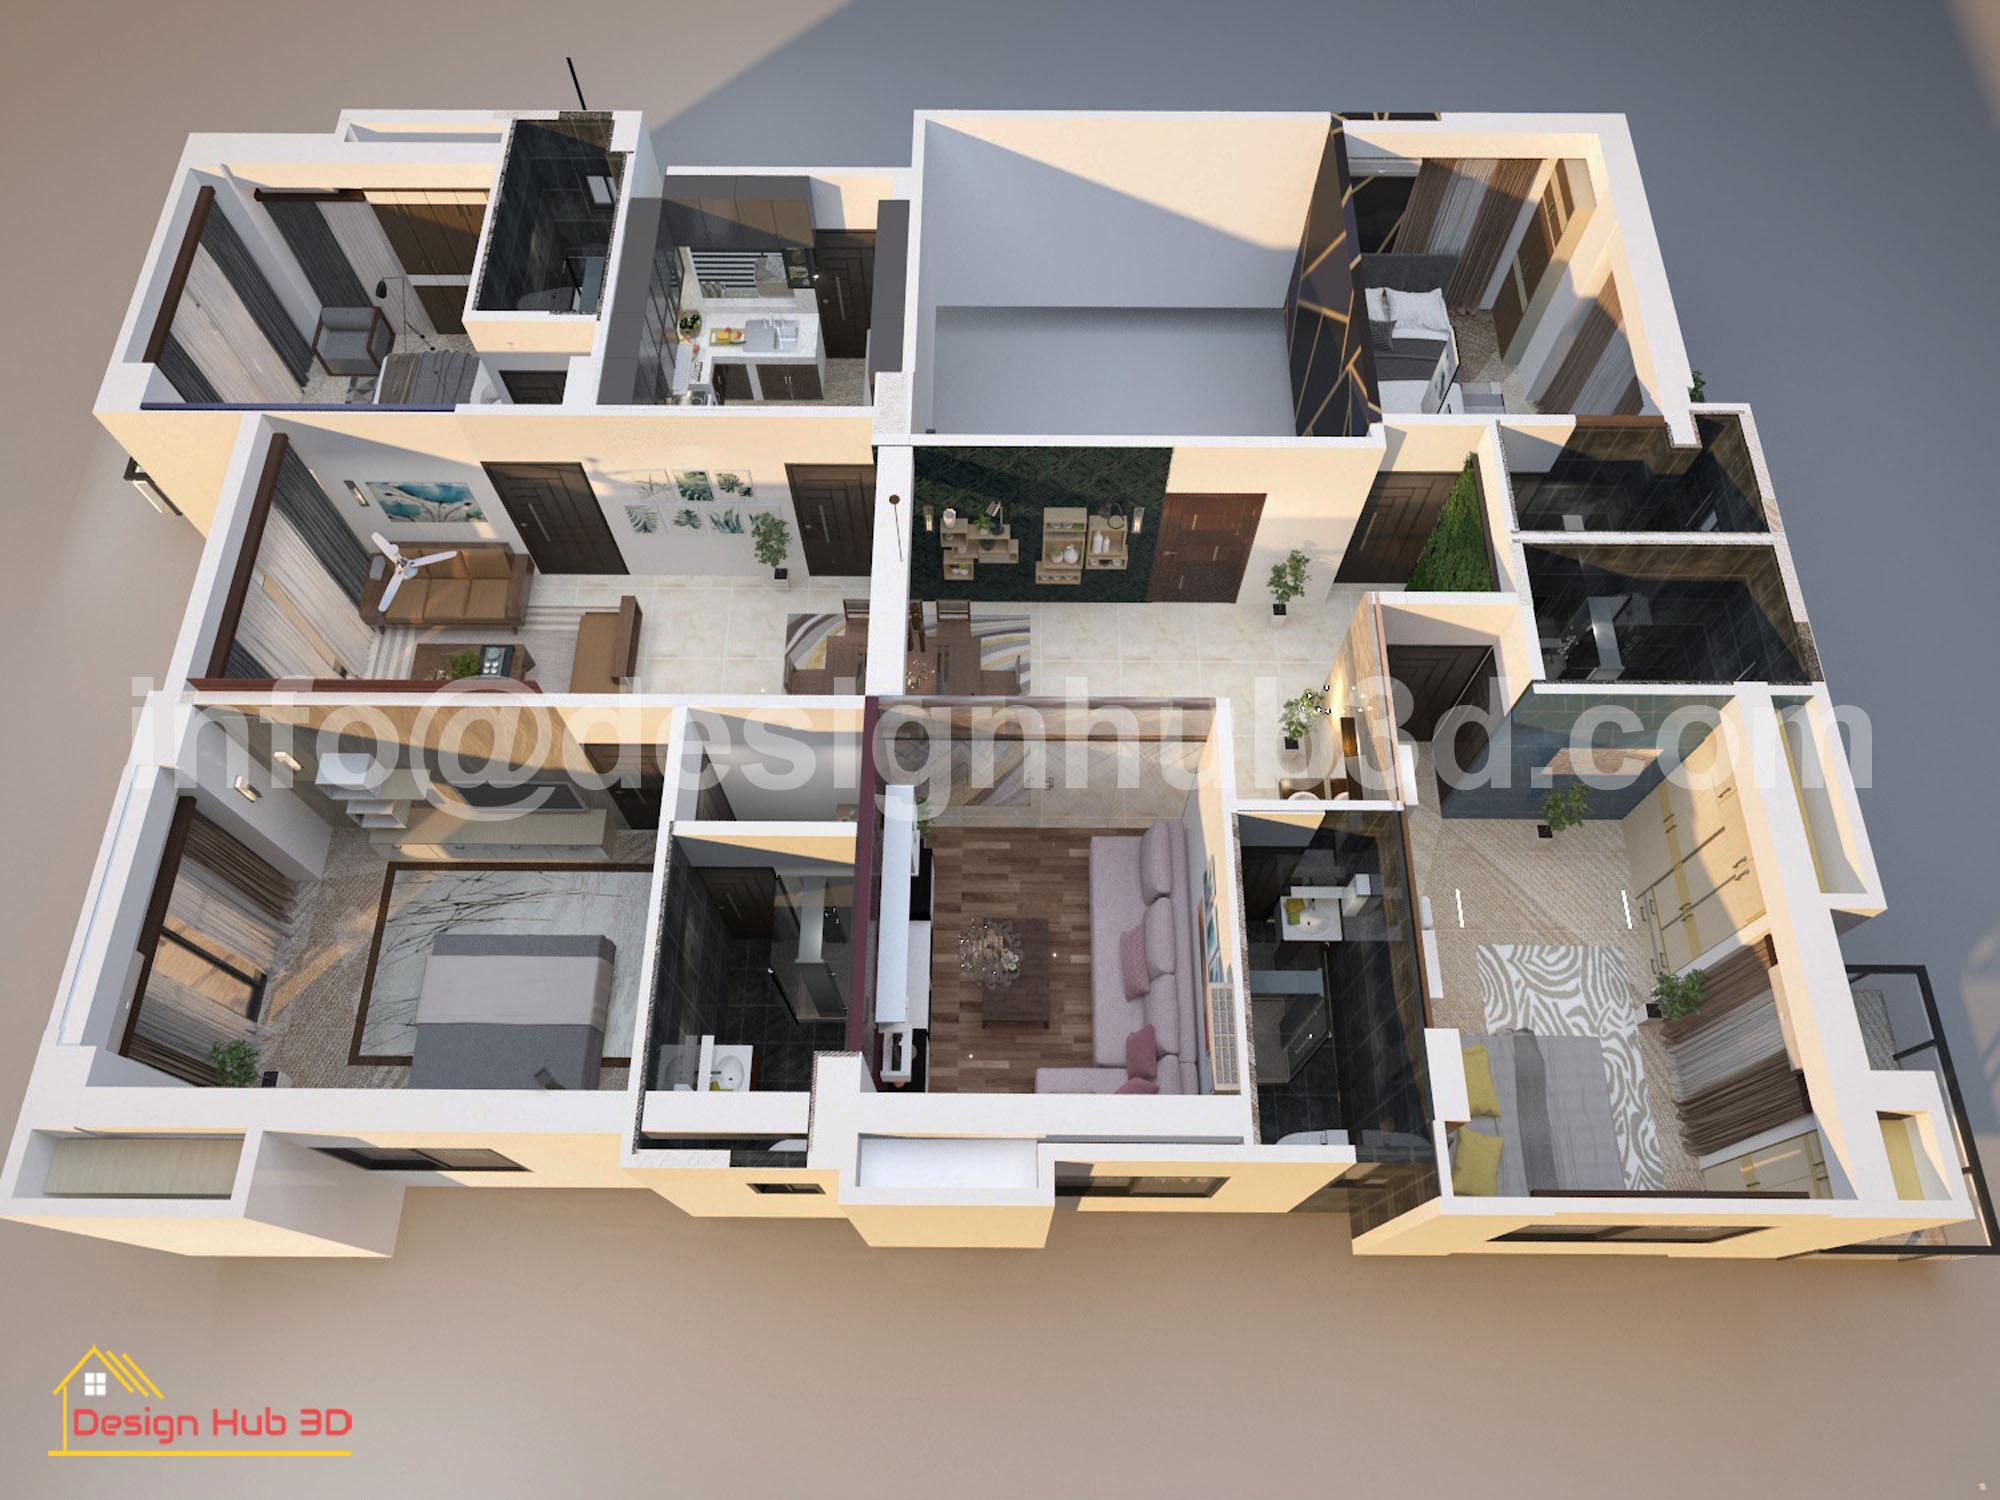 Design Hub 3D - Home Top View 3d modeling